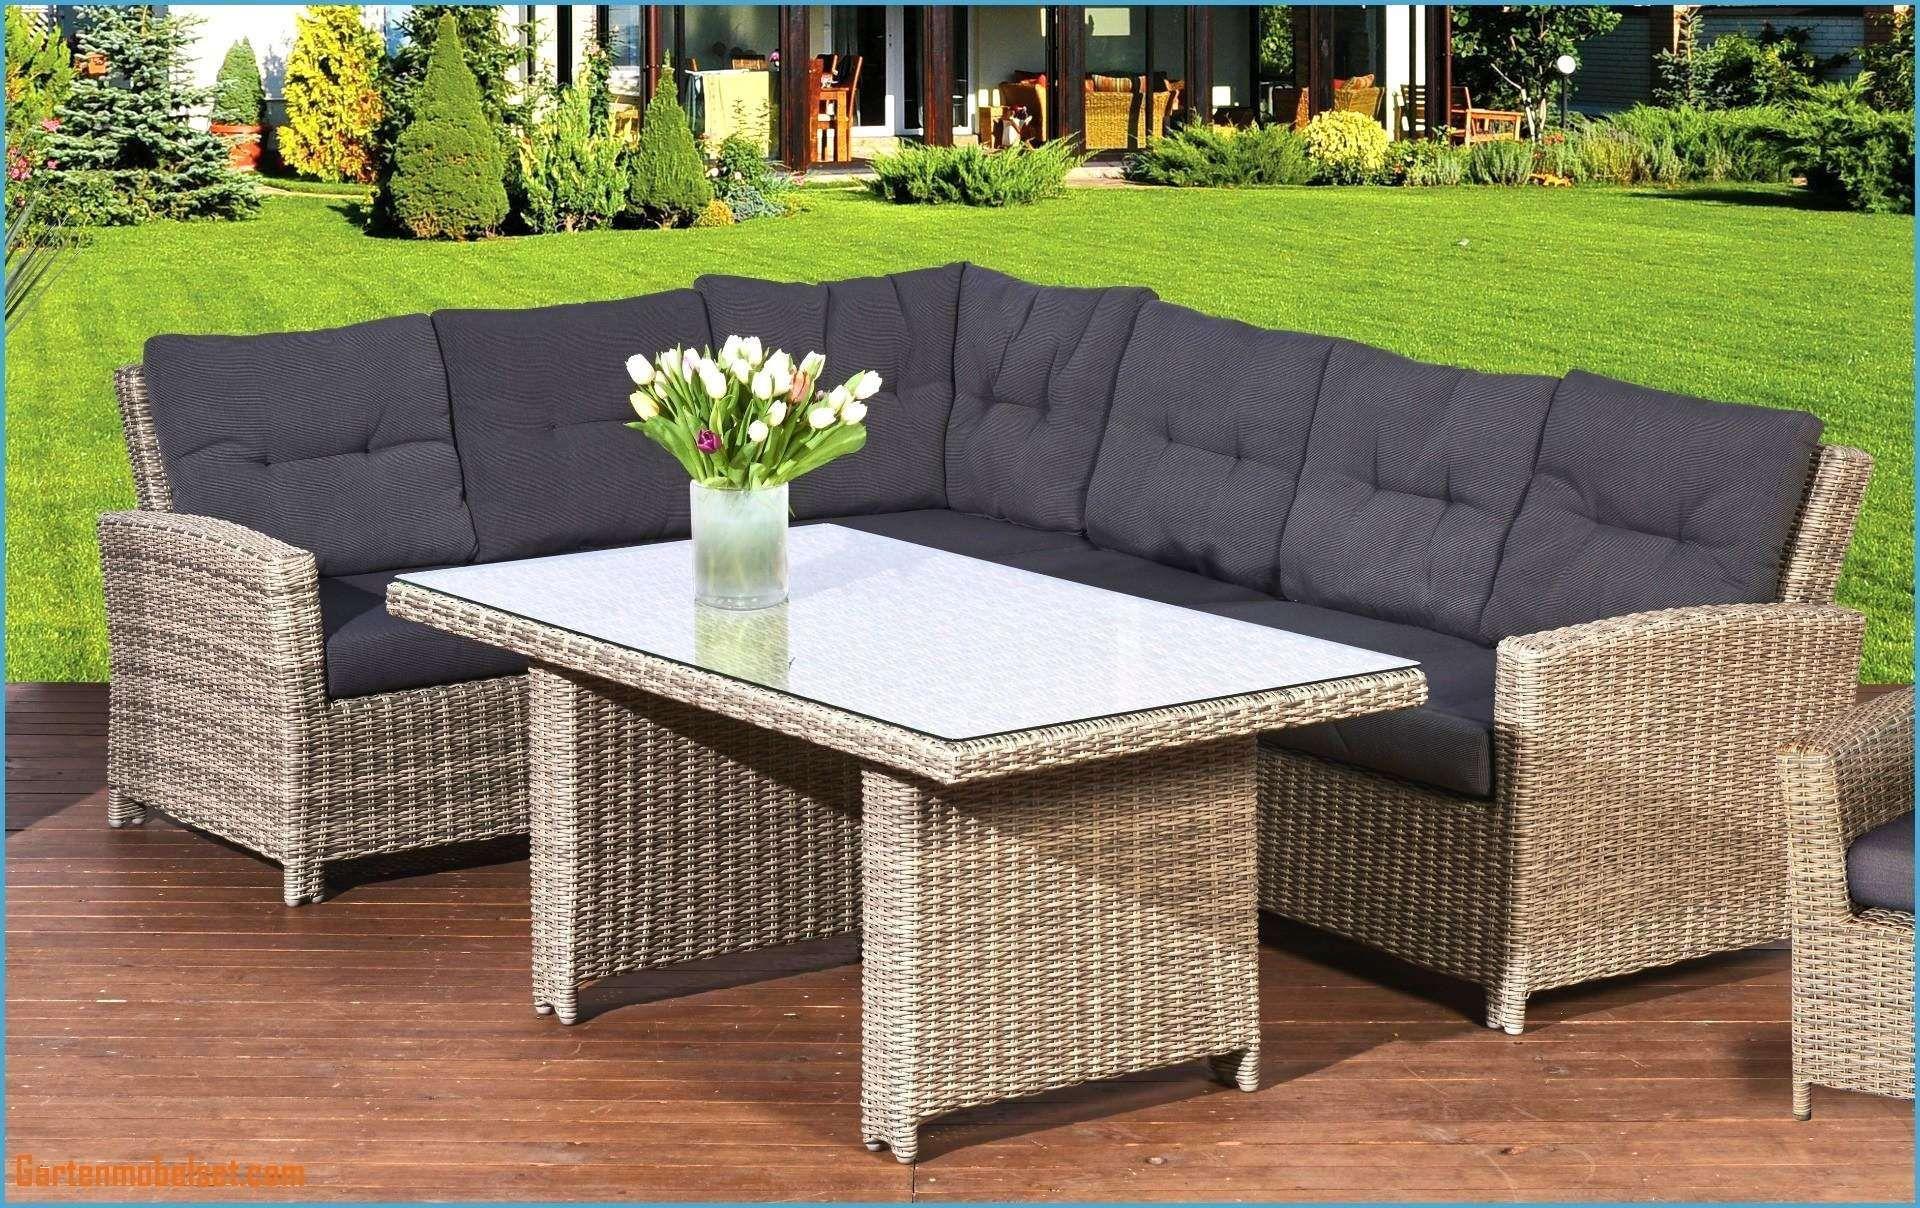 Gartenmobel Lounge Set Gunstig Polyrattan Stuhle Stapelbar Atemberaubend Terrassenmobel Ratta